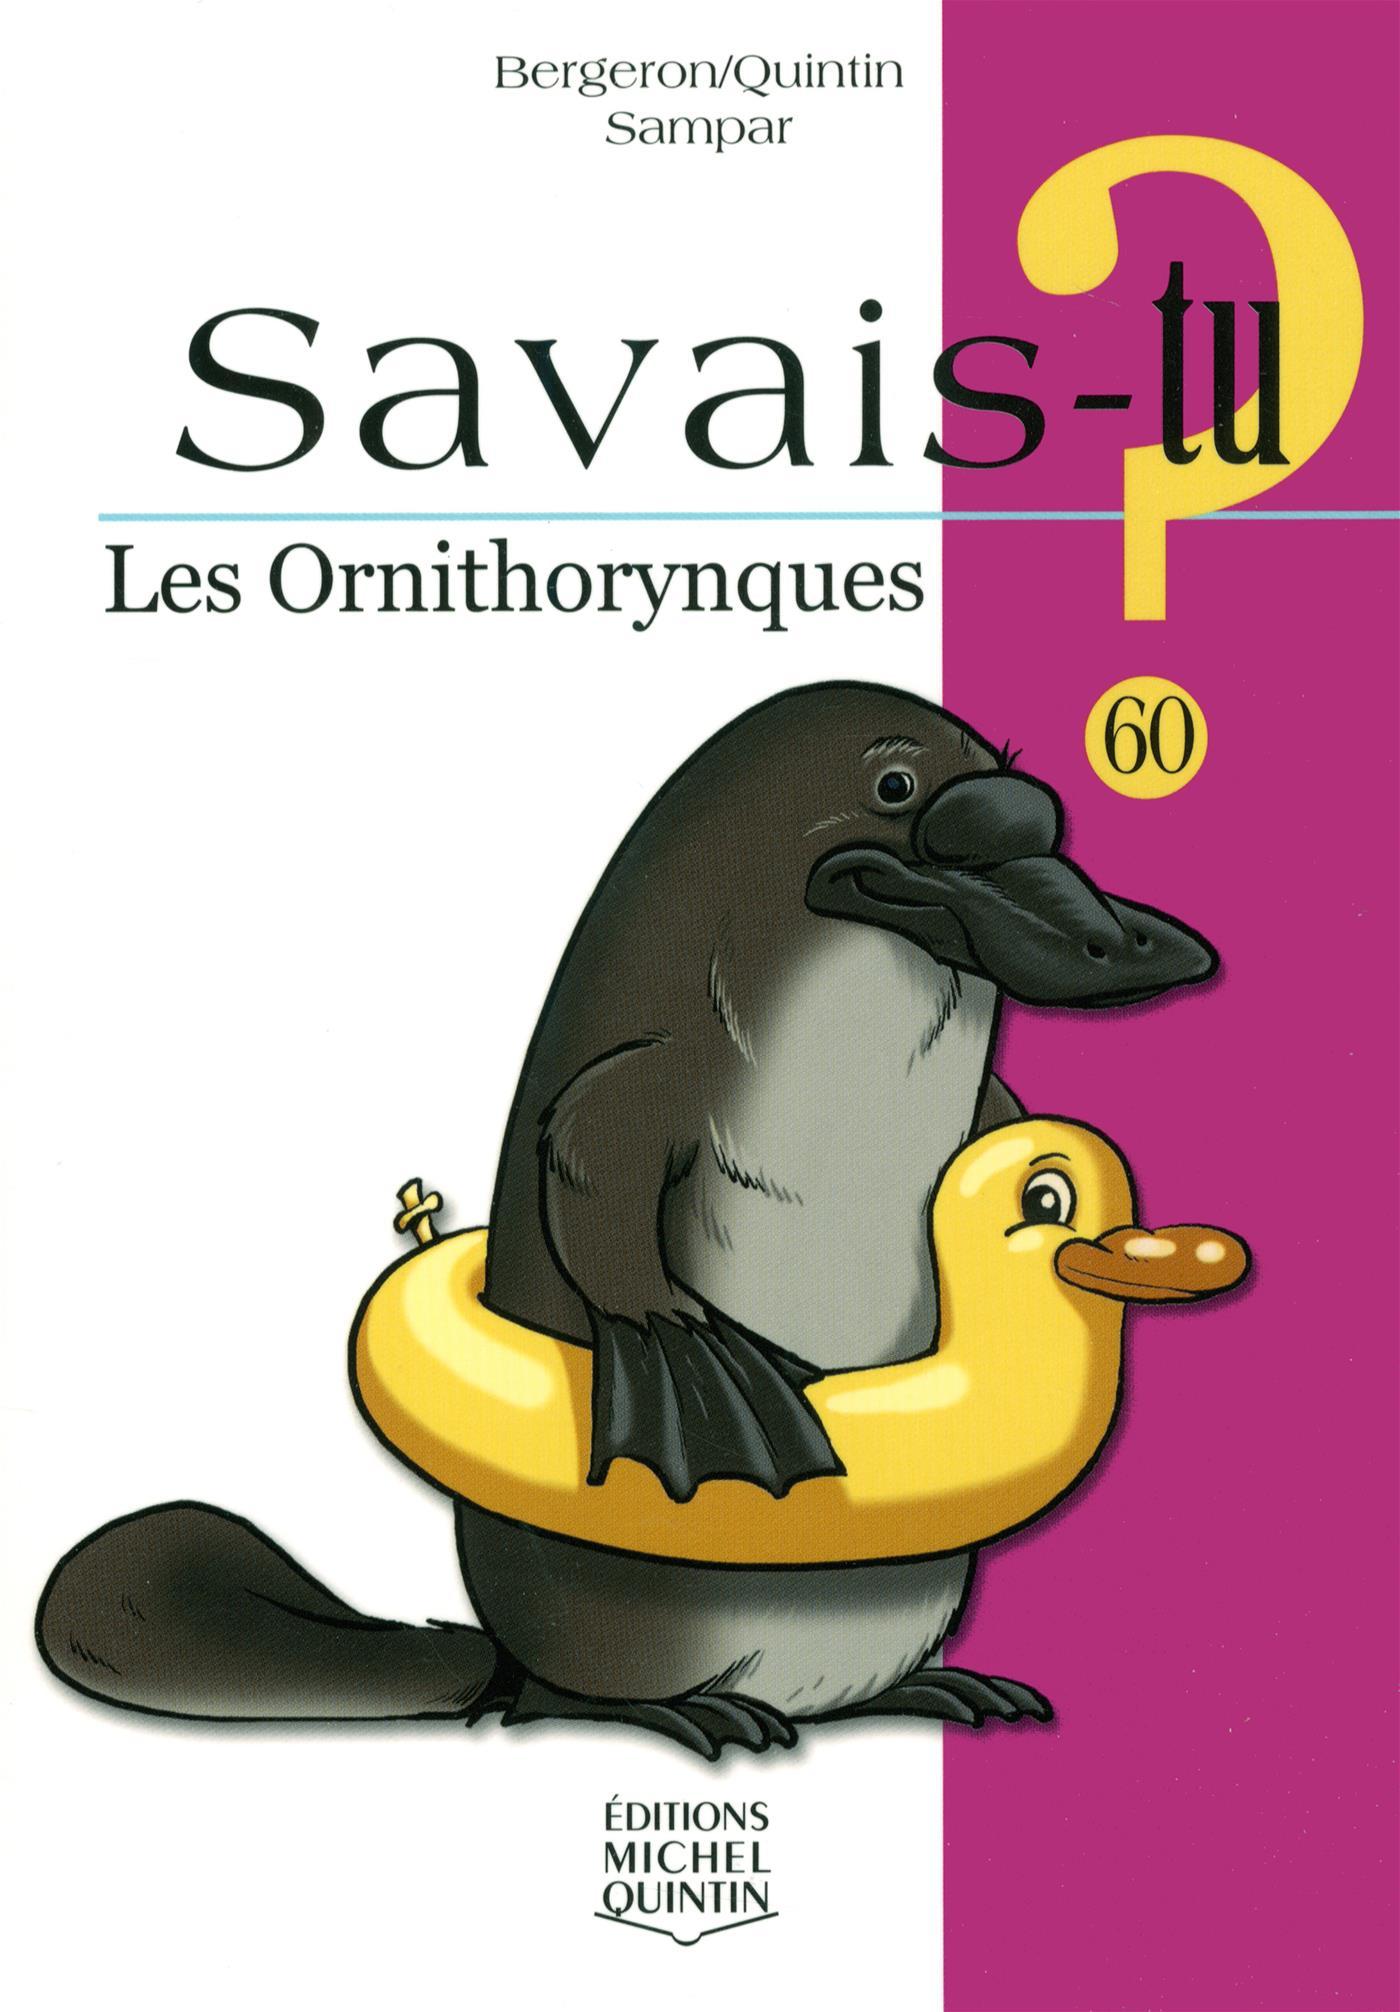 Les ornithorynques